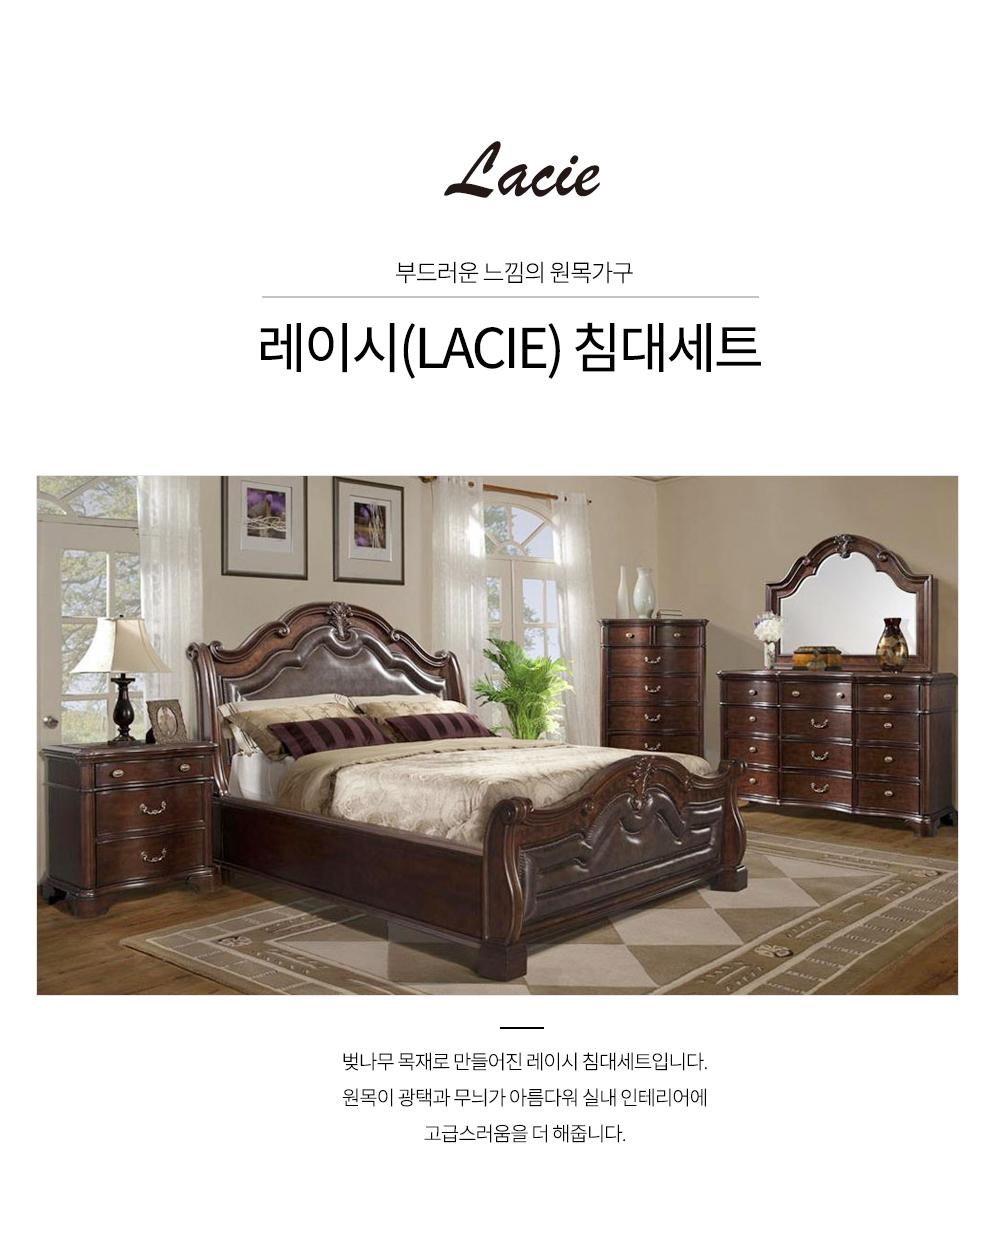 lacie01.jpg